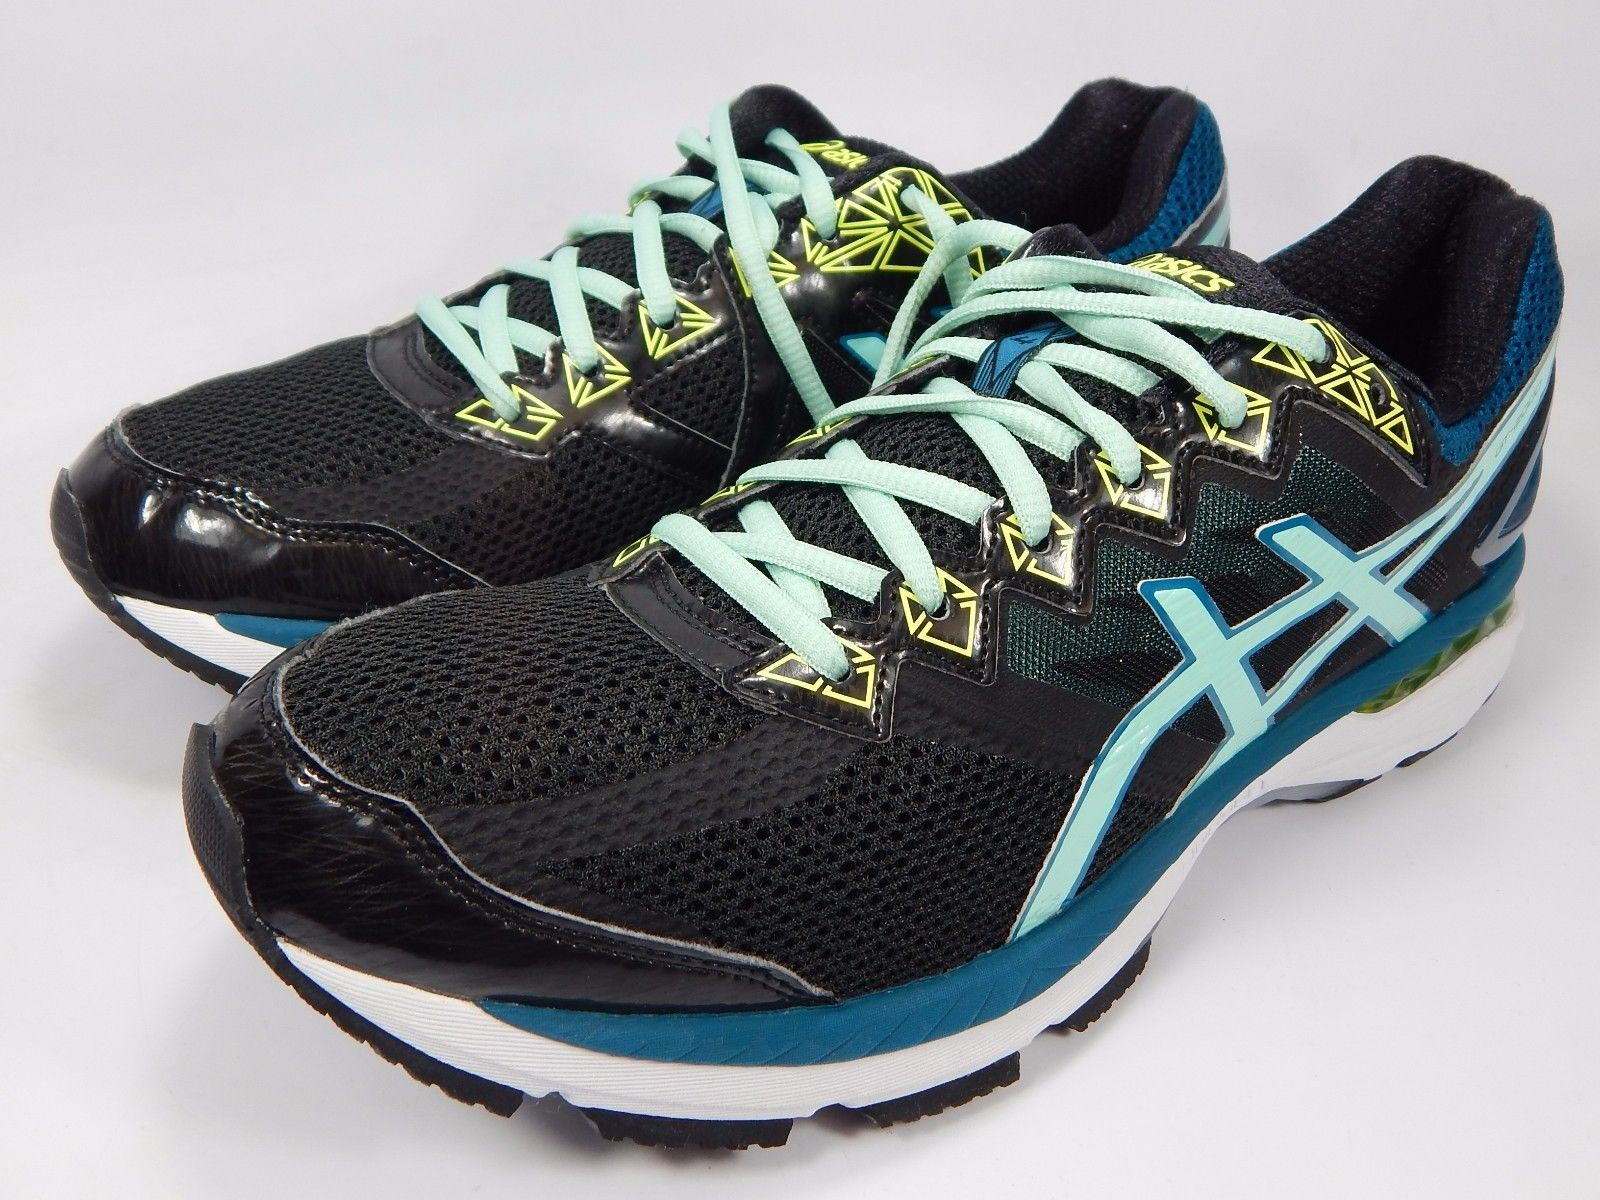 Asics GT 2000 v 4 Women's Running Shoes Size US 12 M (B) EU 44.5 Black T656N